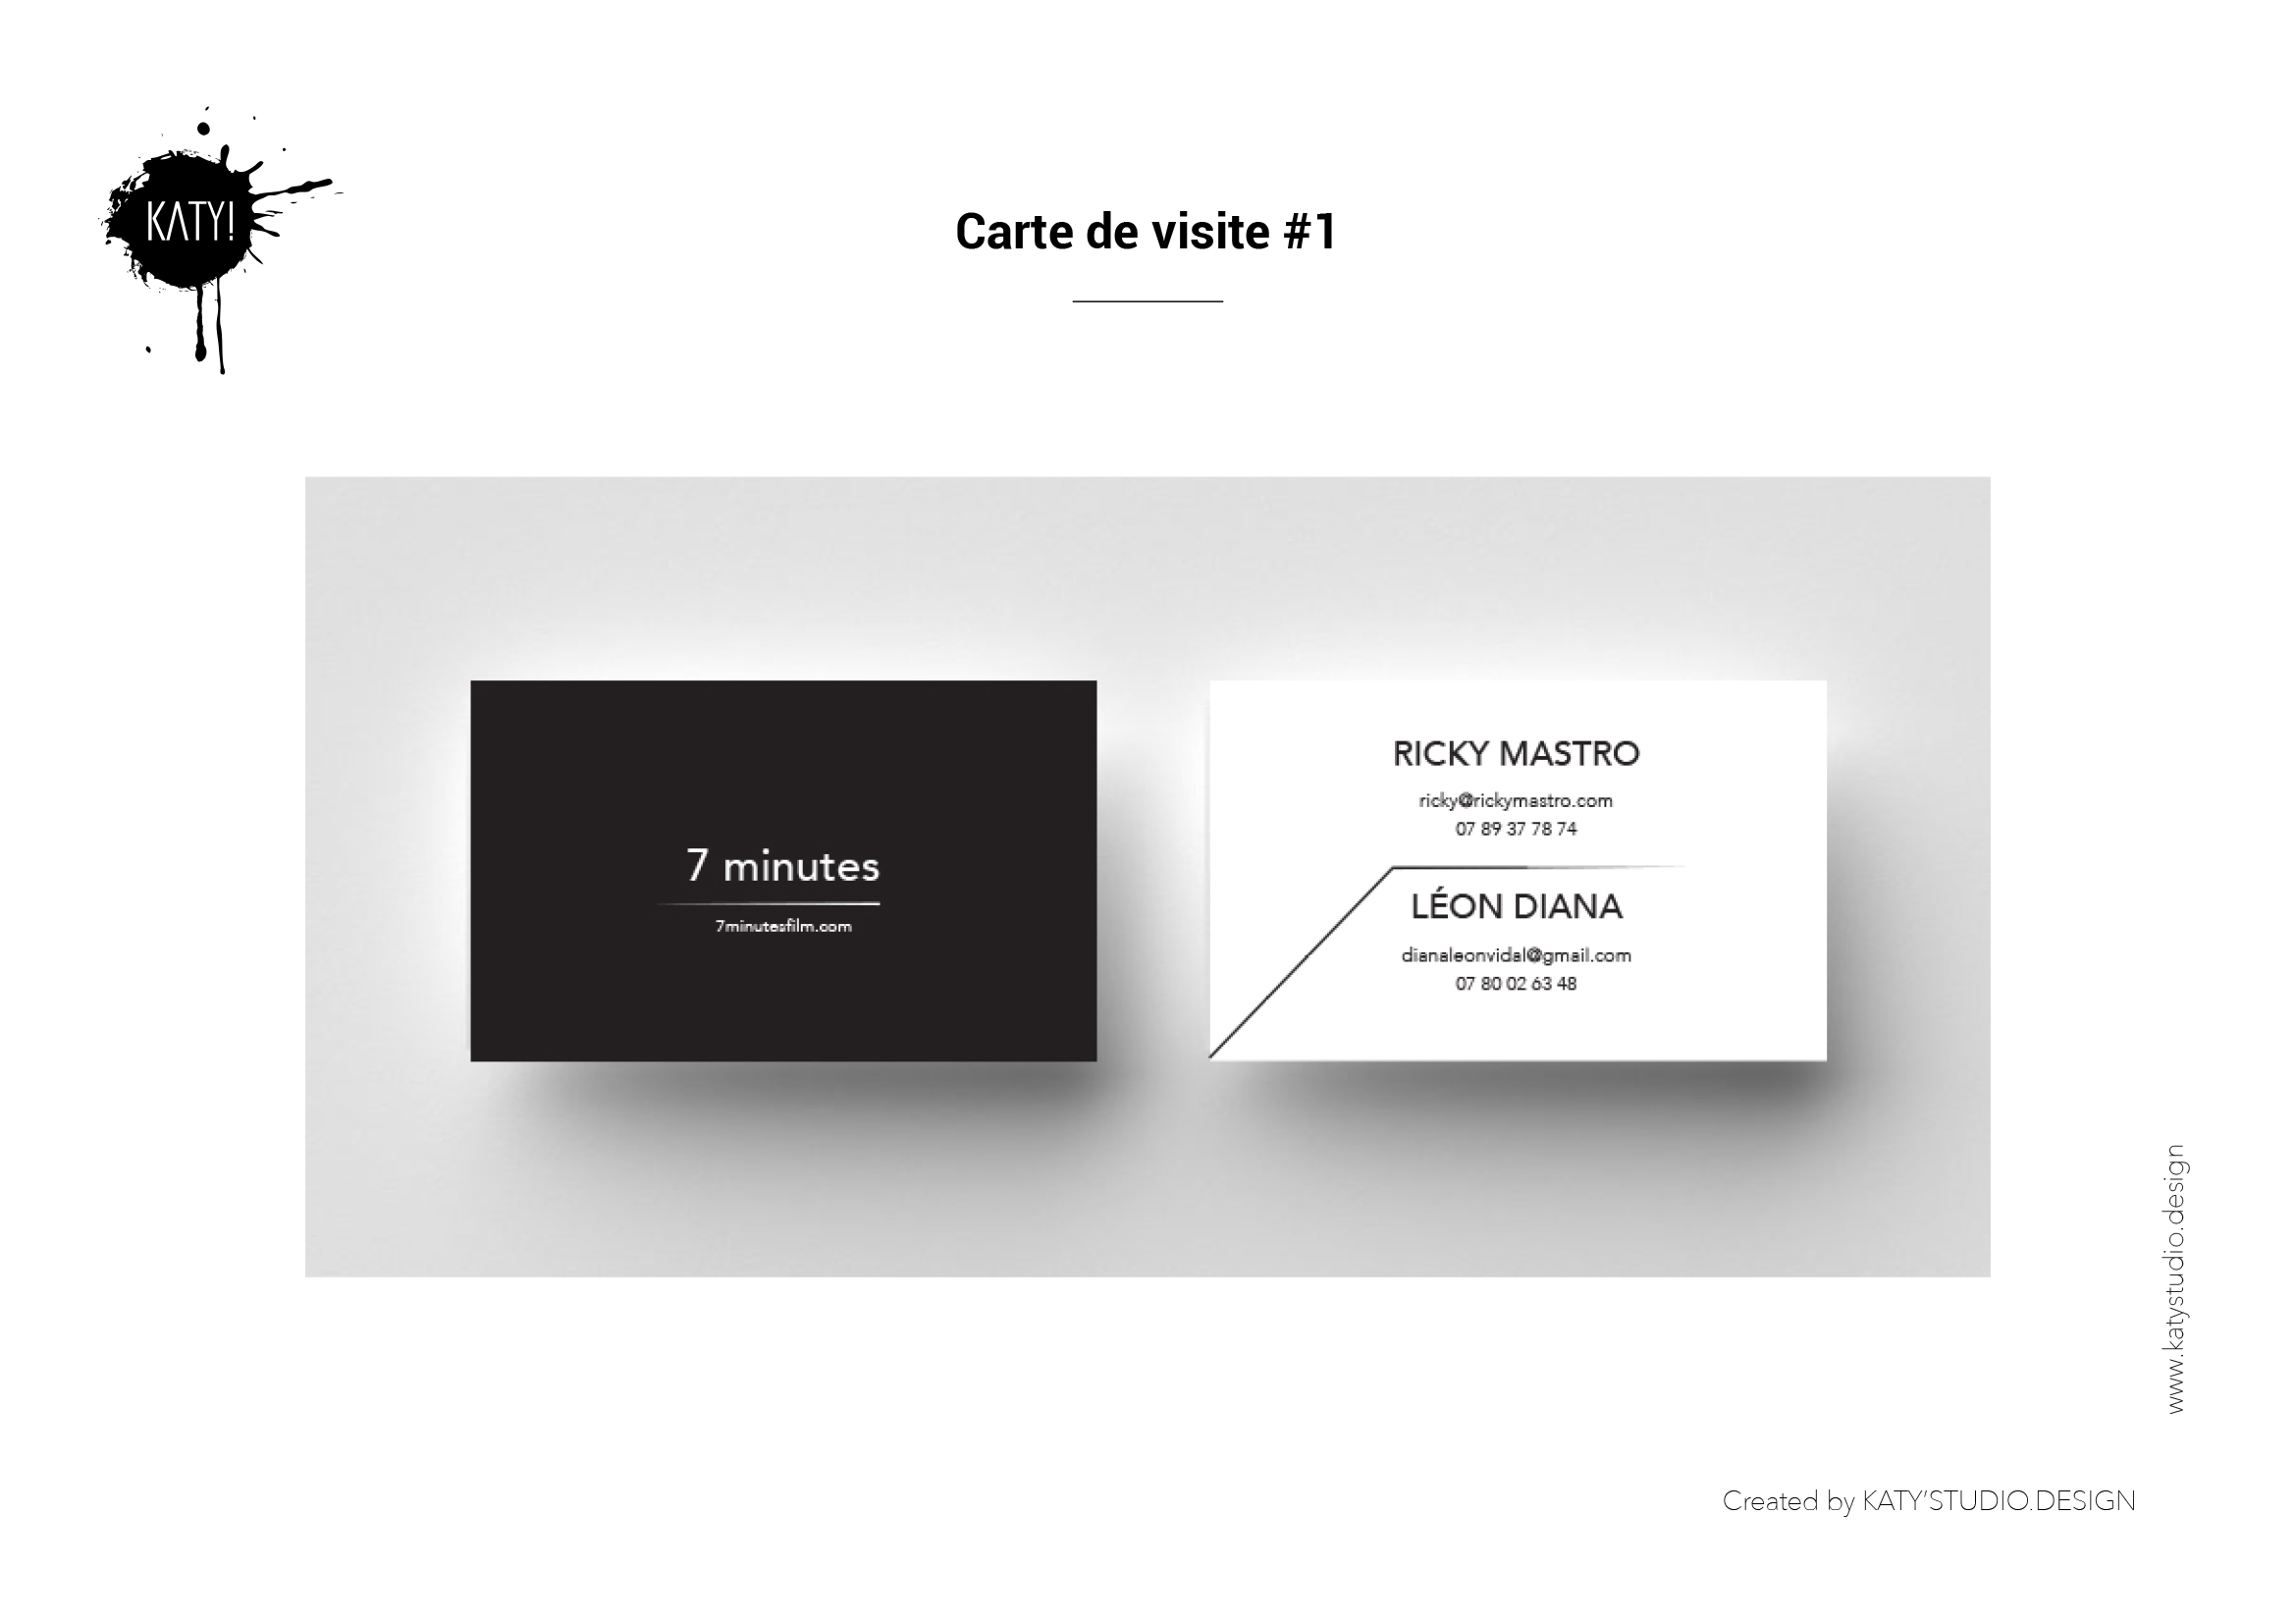 7min_carte-de-visite_info-1